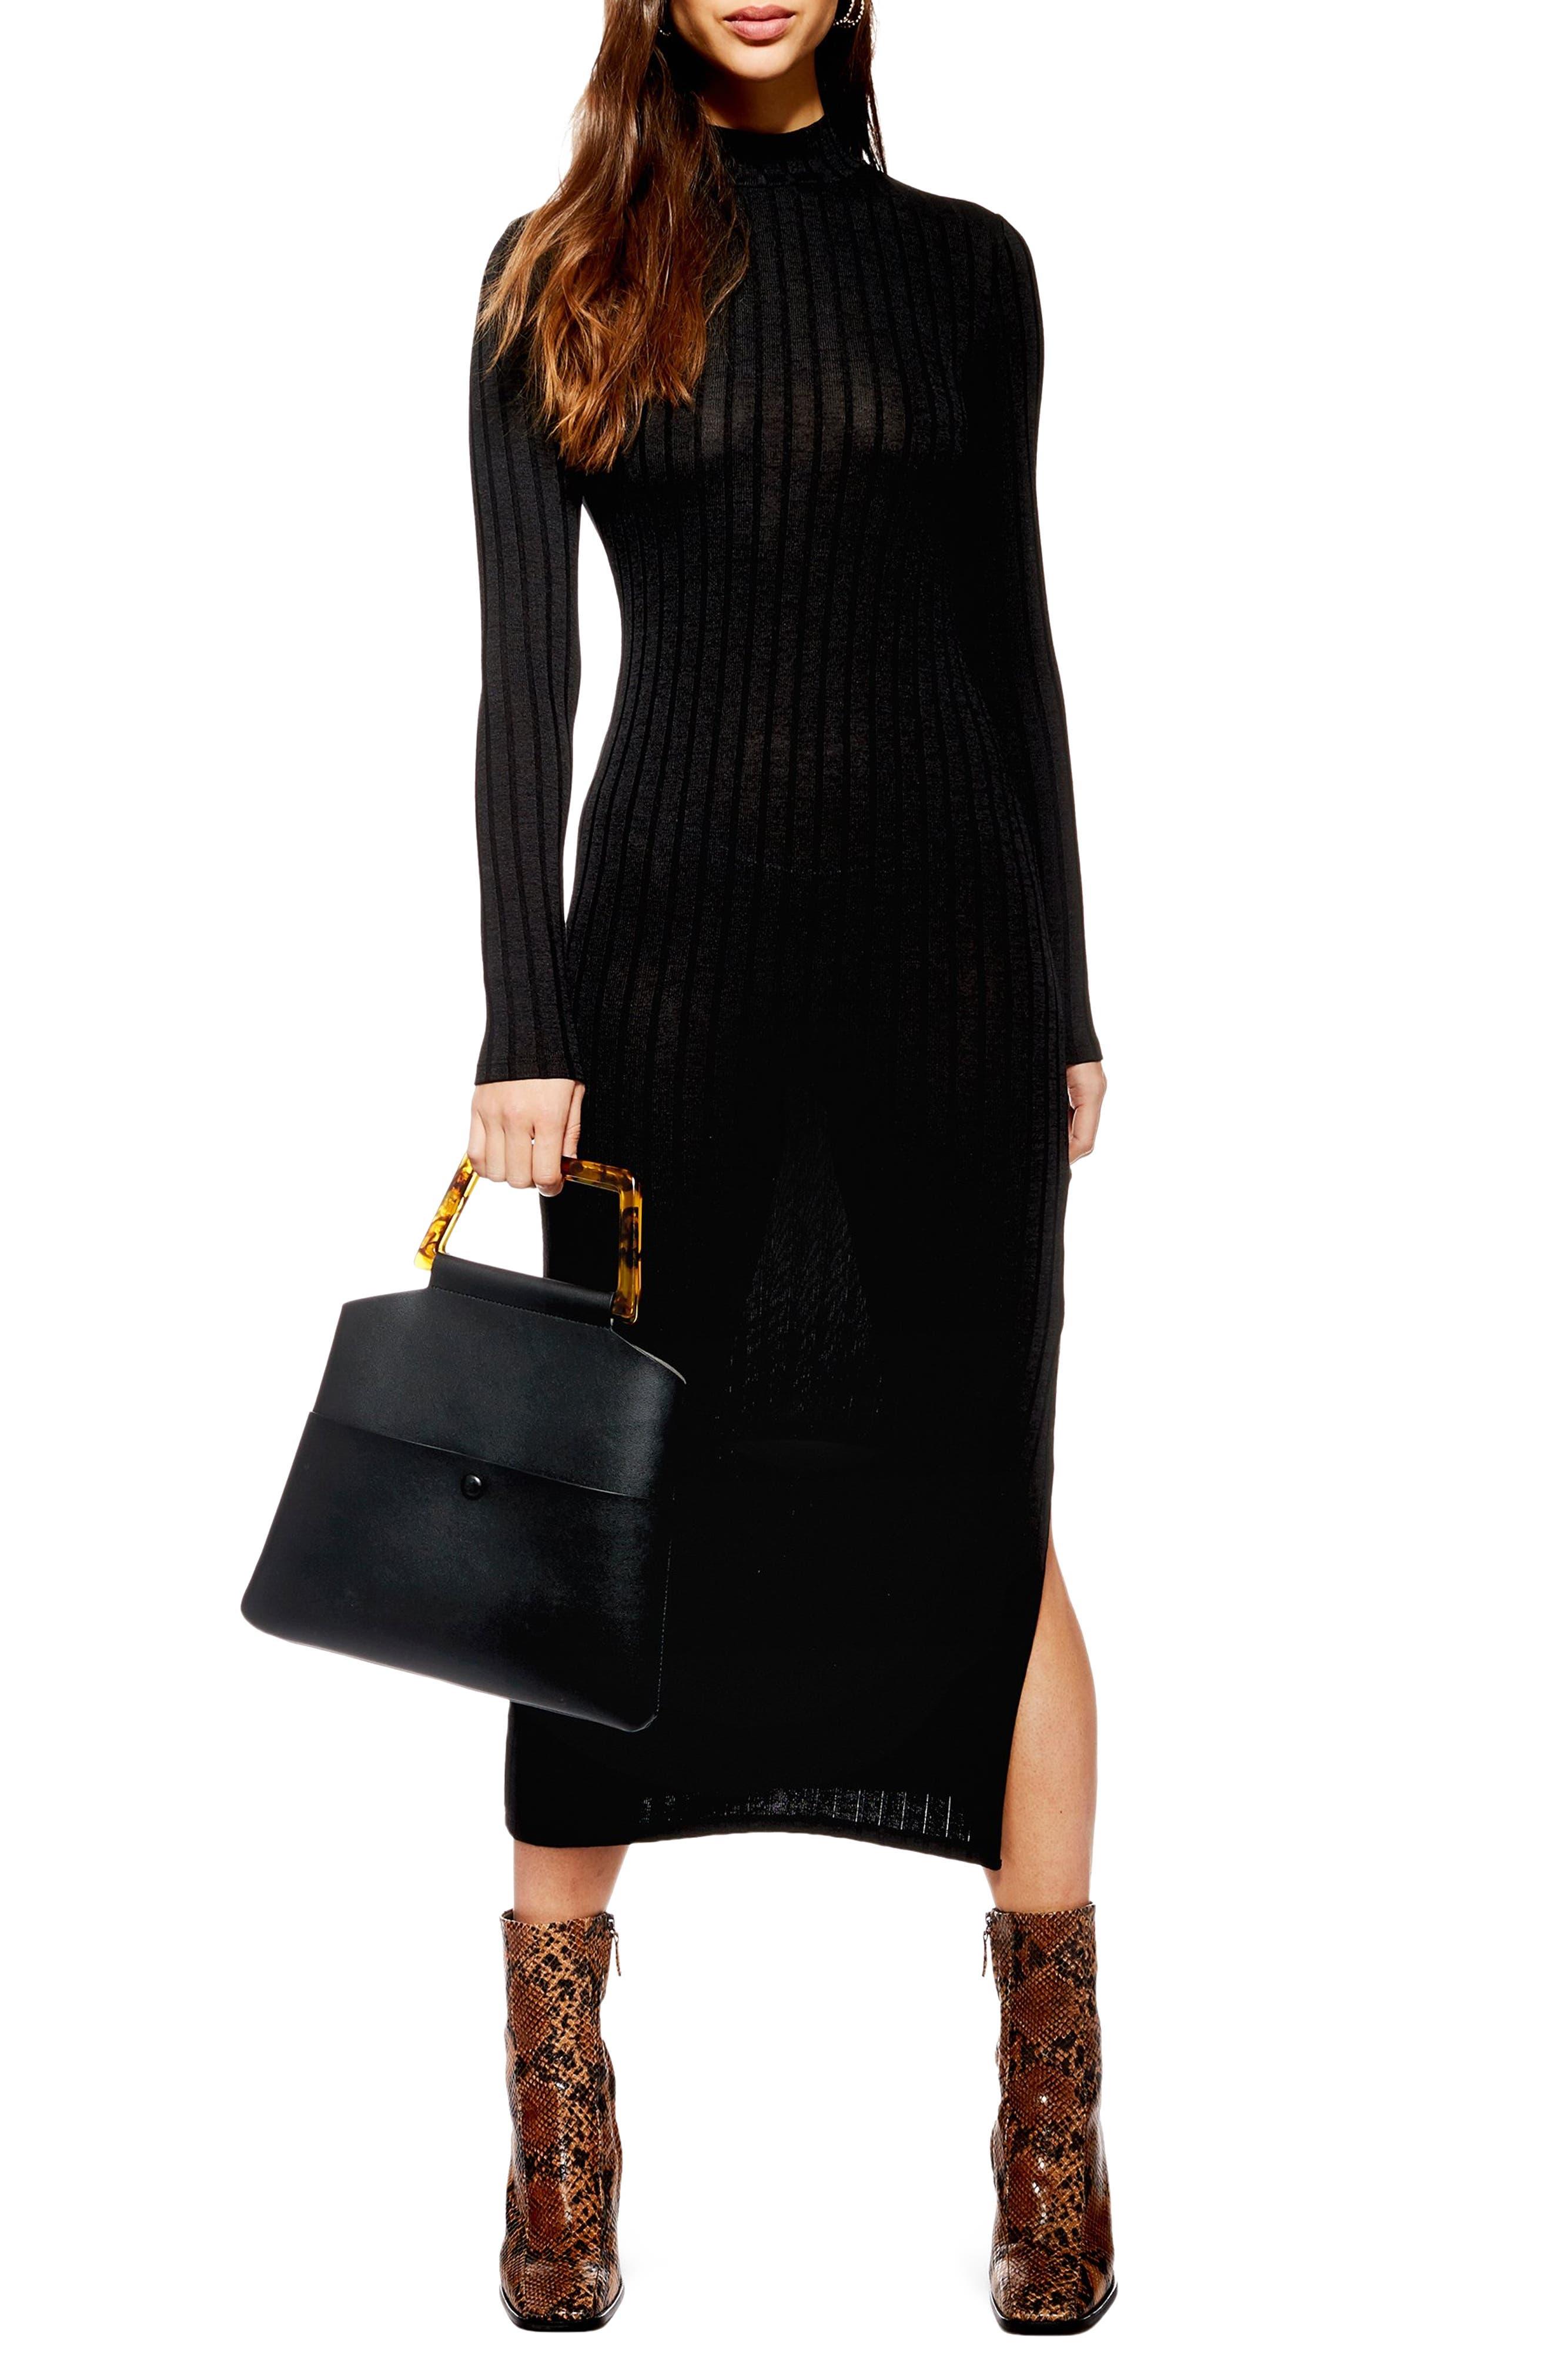 TOPSHOP, High Neck Ribbed Midi Dress, Main thumbnail 1, color, BLACK